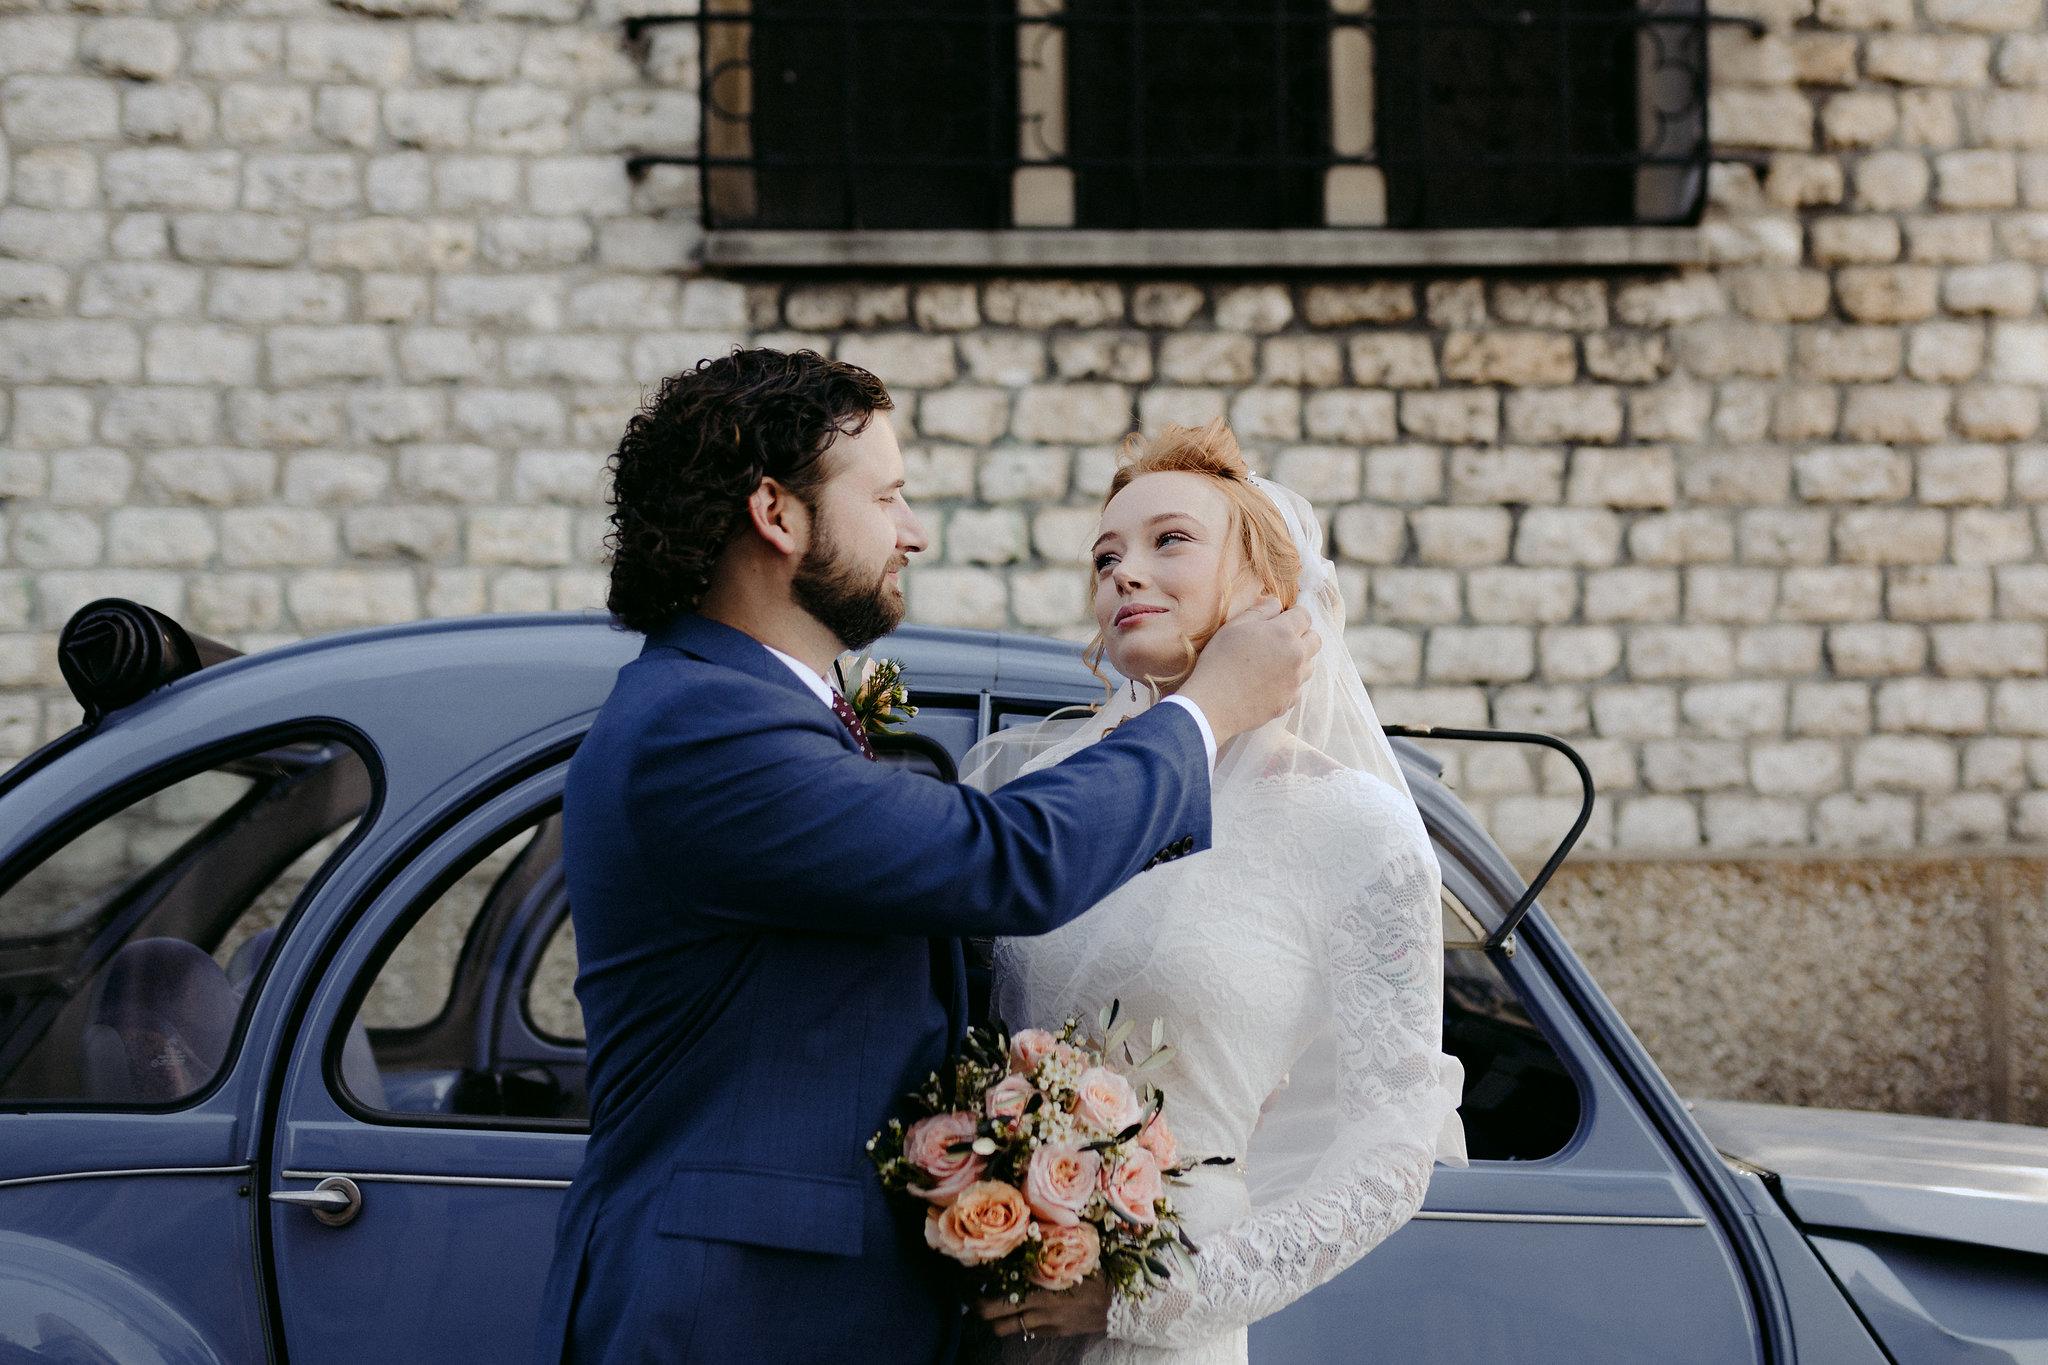 Paris_elopement_wedding_photographer-144.jpg